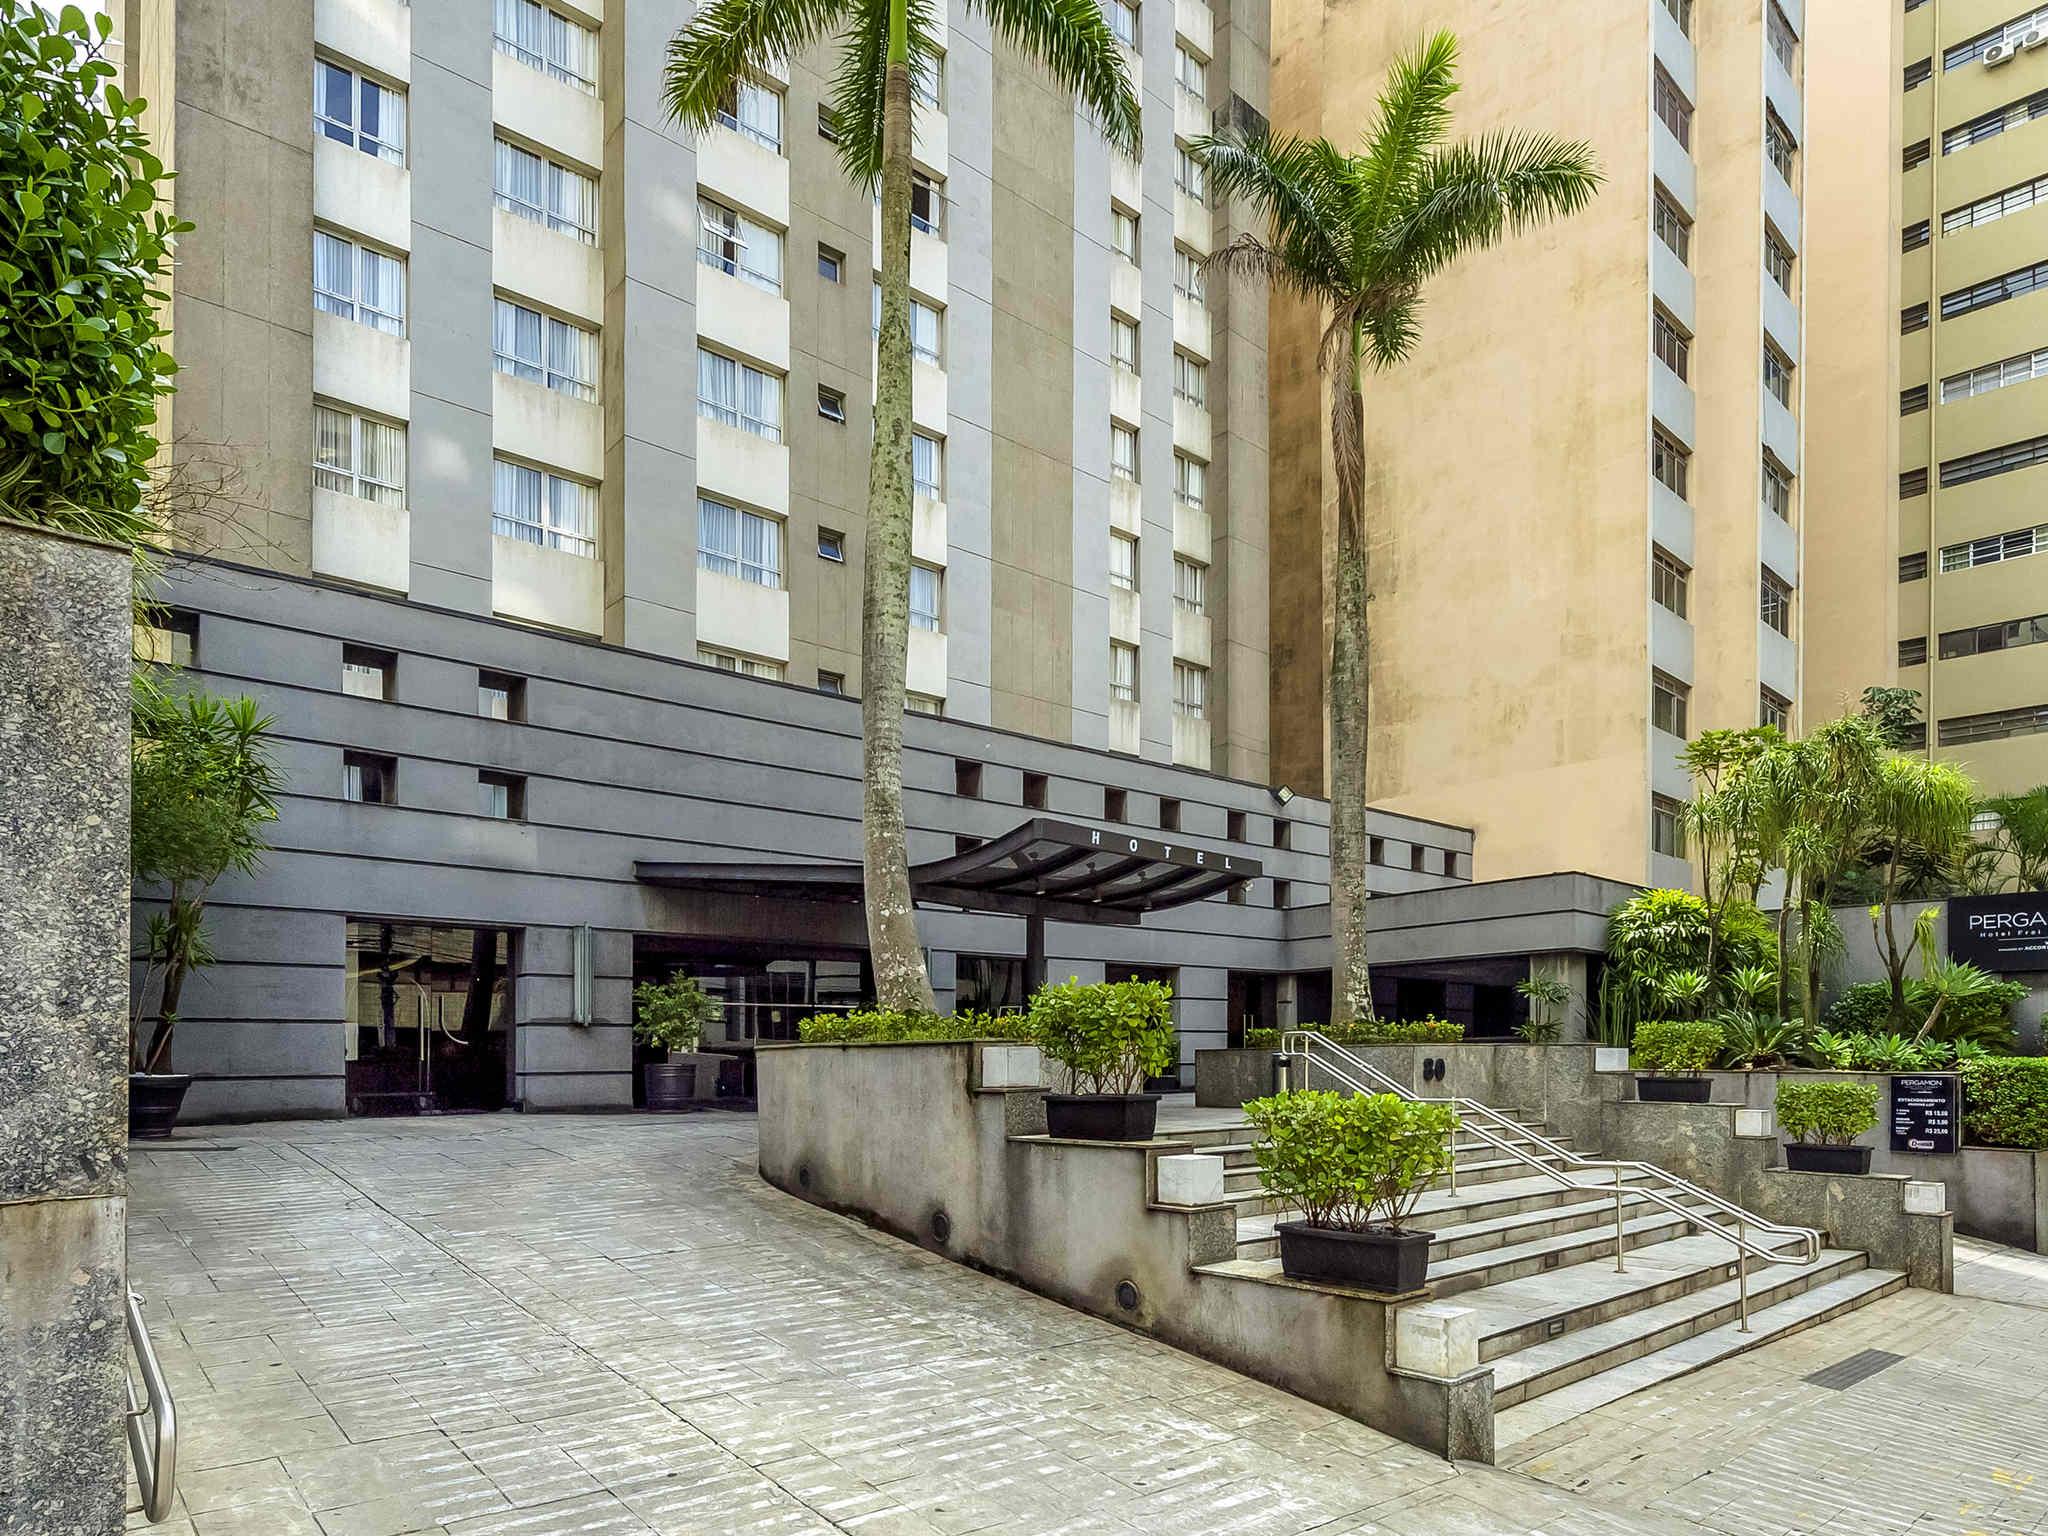 Hotel – Pergamon Hotel Frei Caneca onder beheer van AccorHotels